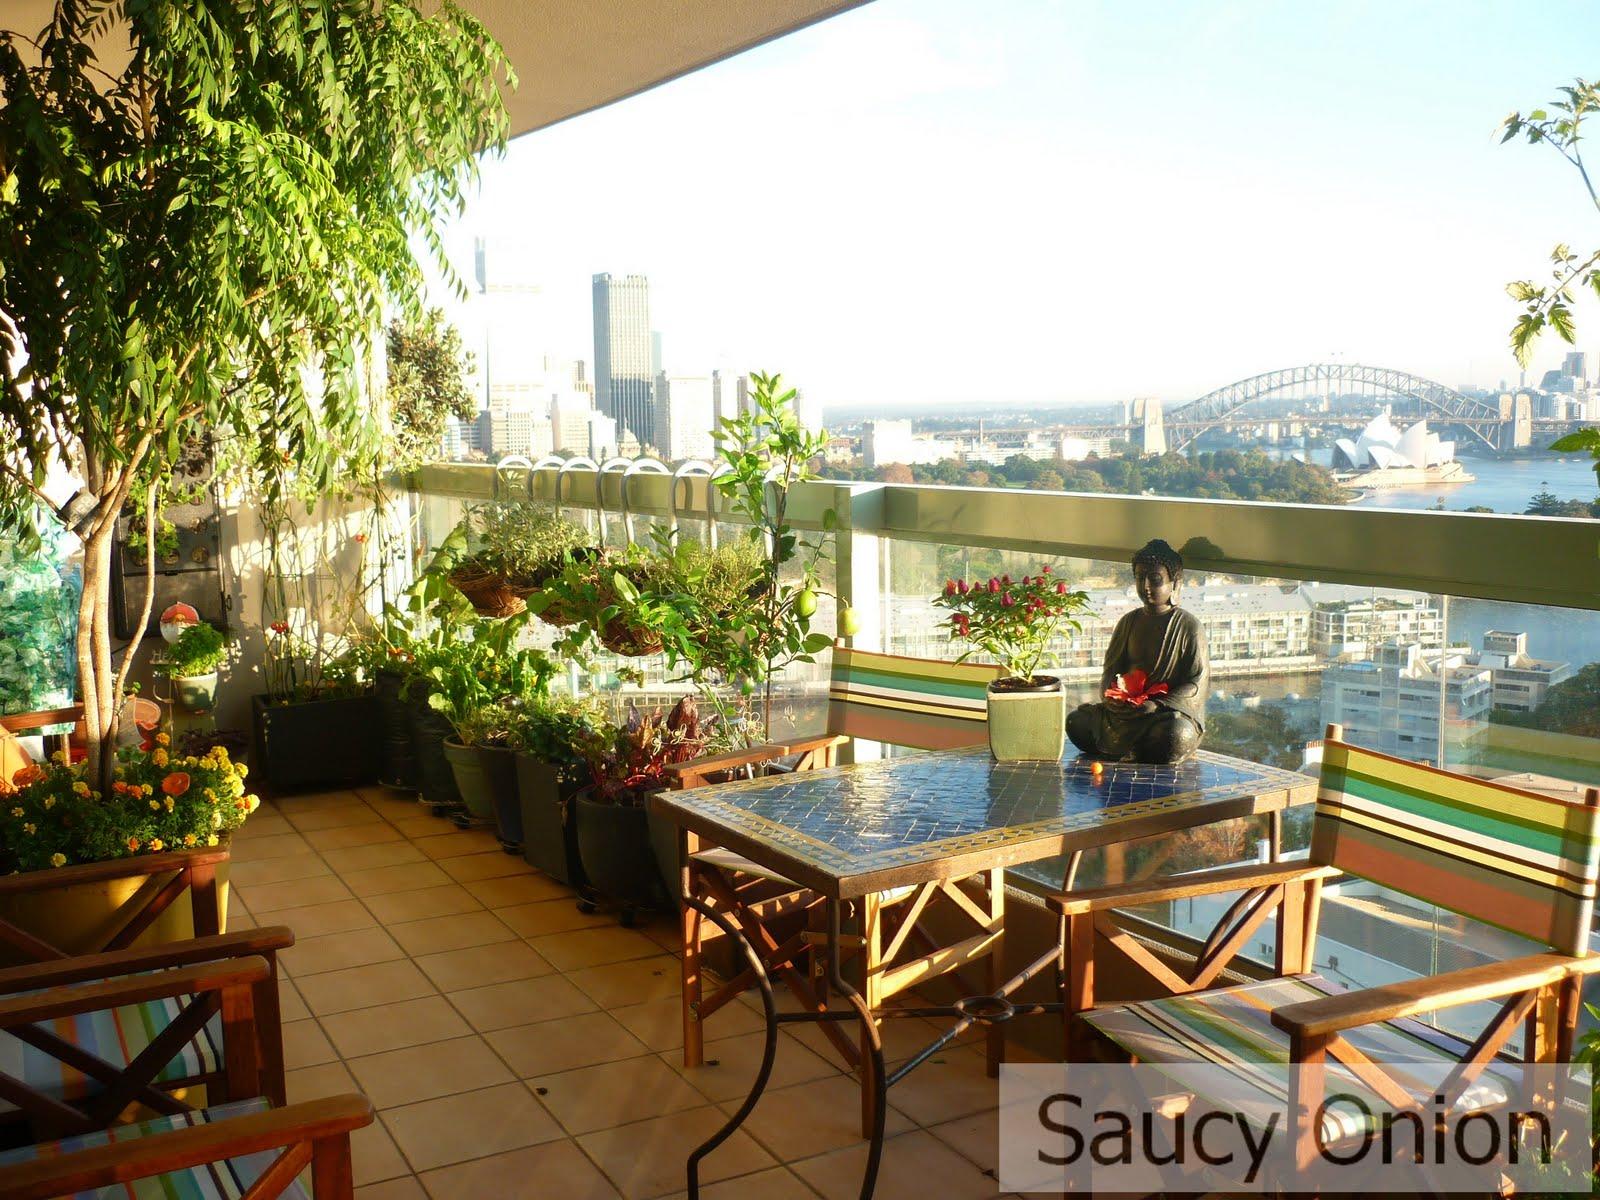 edible balcony u2013 awash with morning sun saucy onion